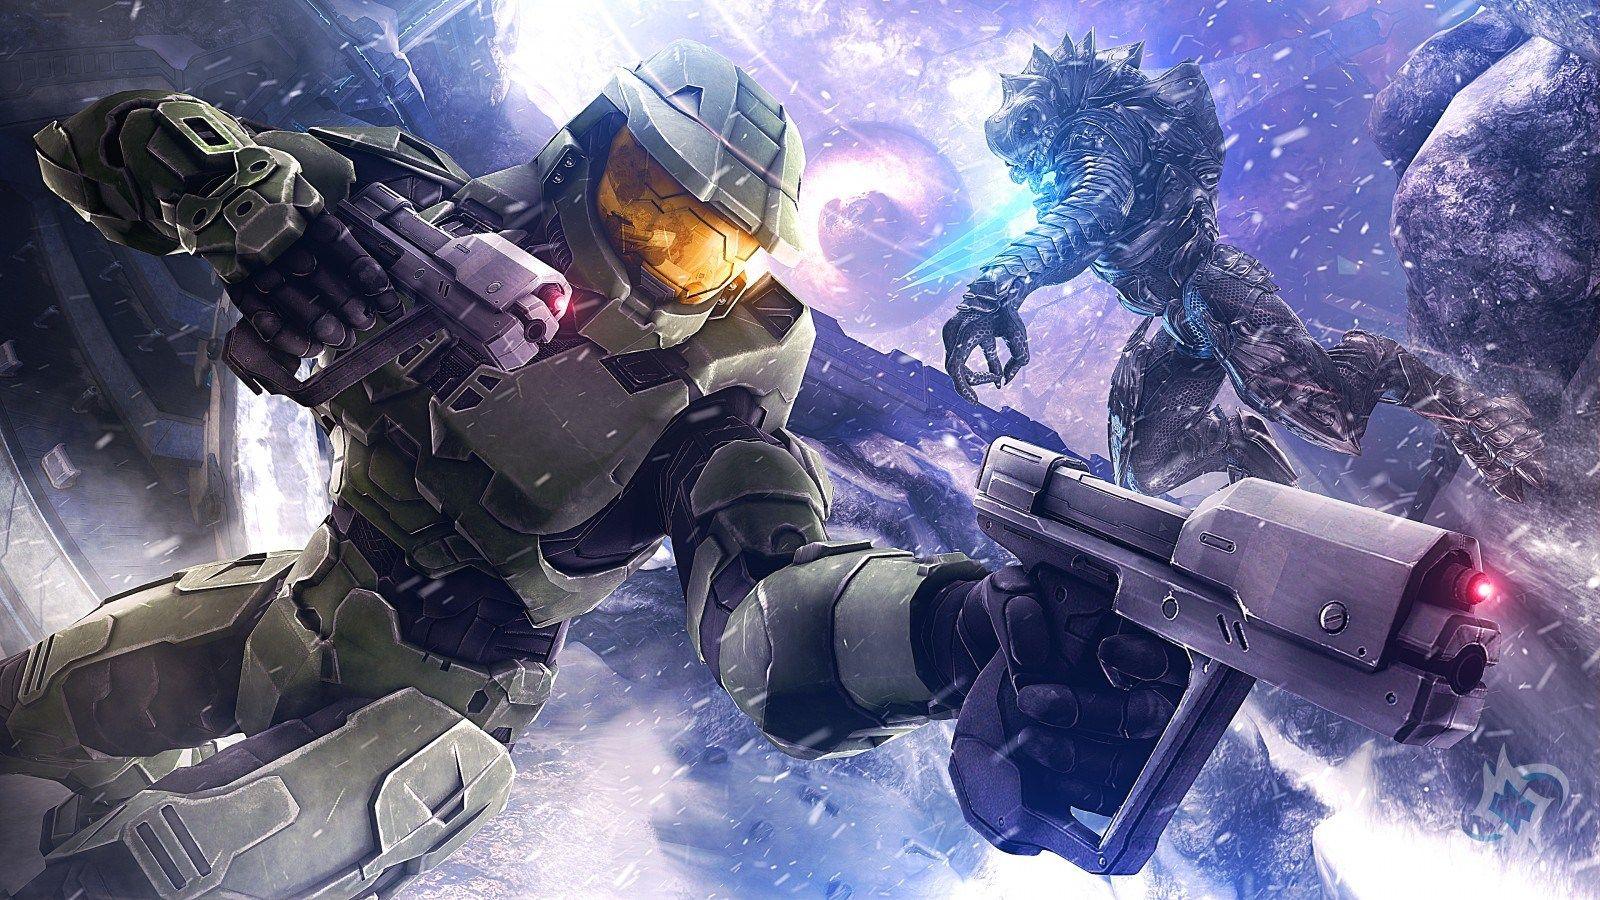 Free Download Halo Infinite 4k Wallpaper Images Halo Fondos De Pantalla Fondo De Pantalla Gotico Halo Dibujo